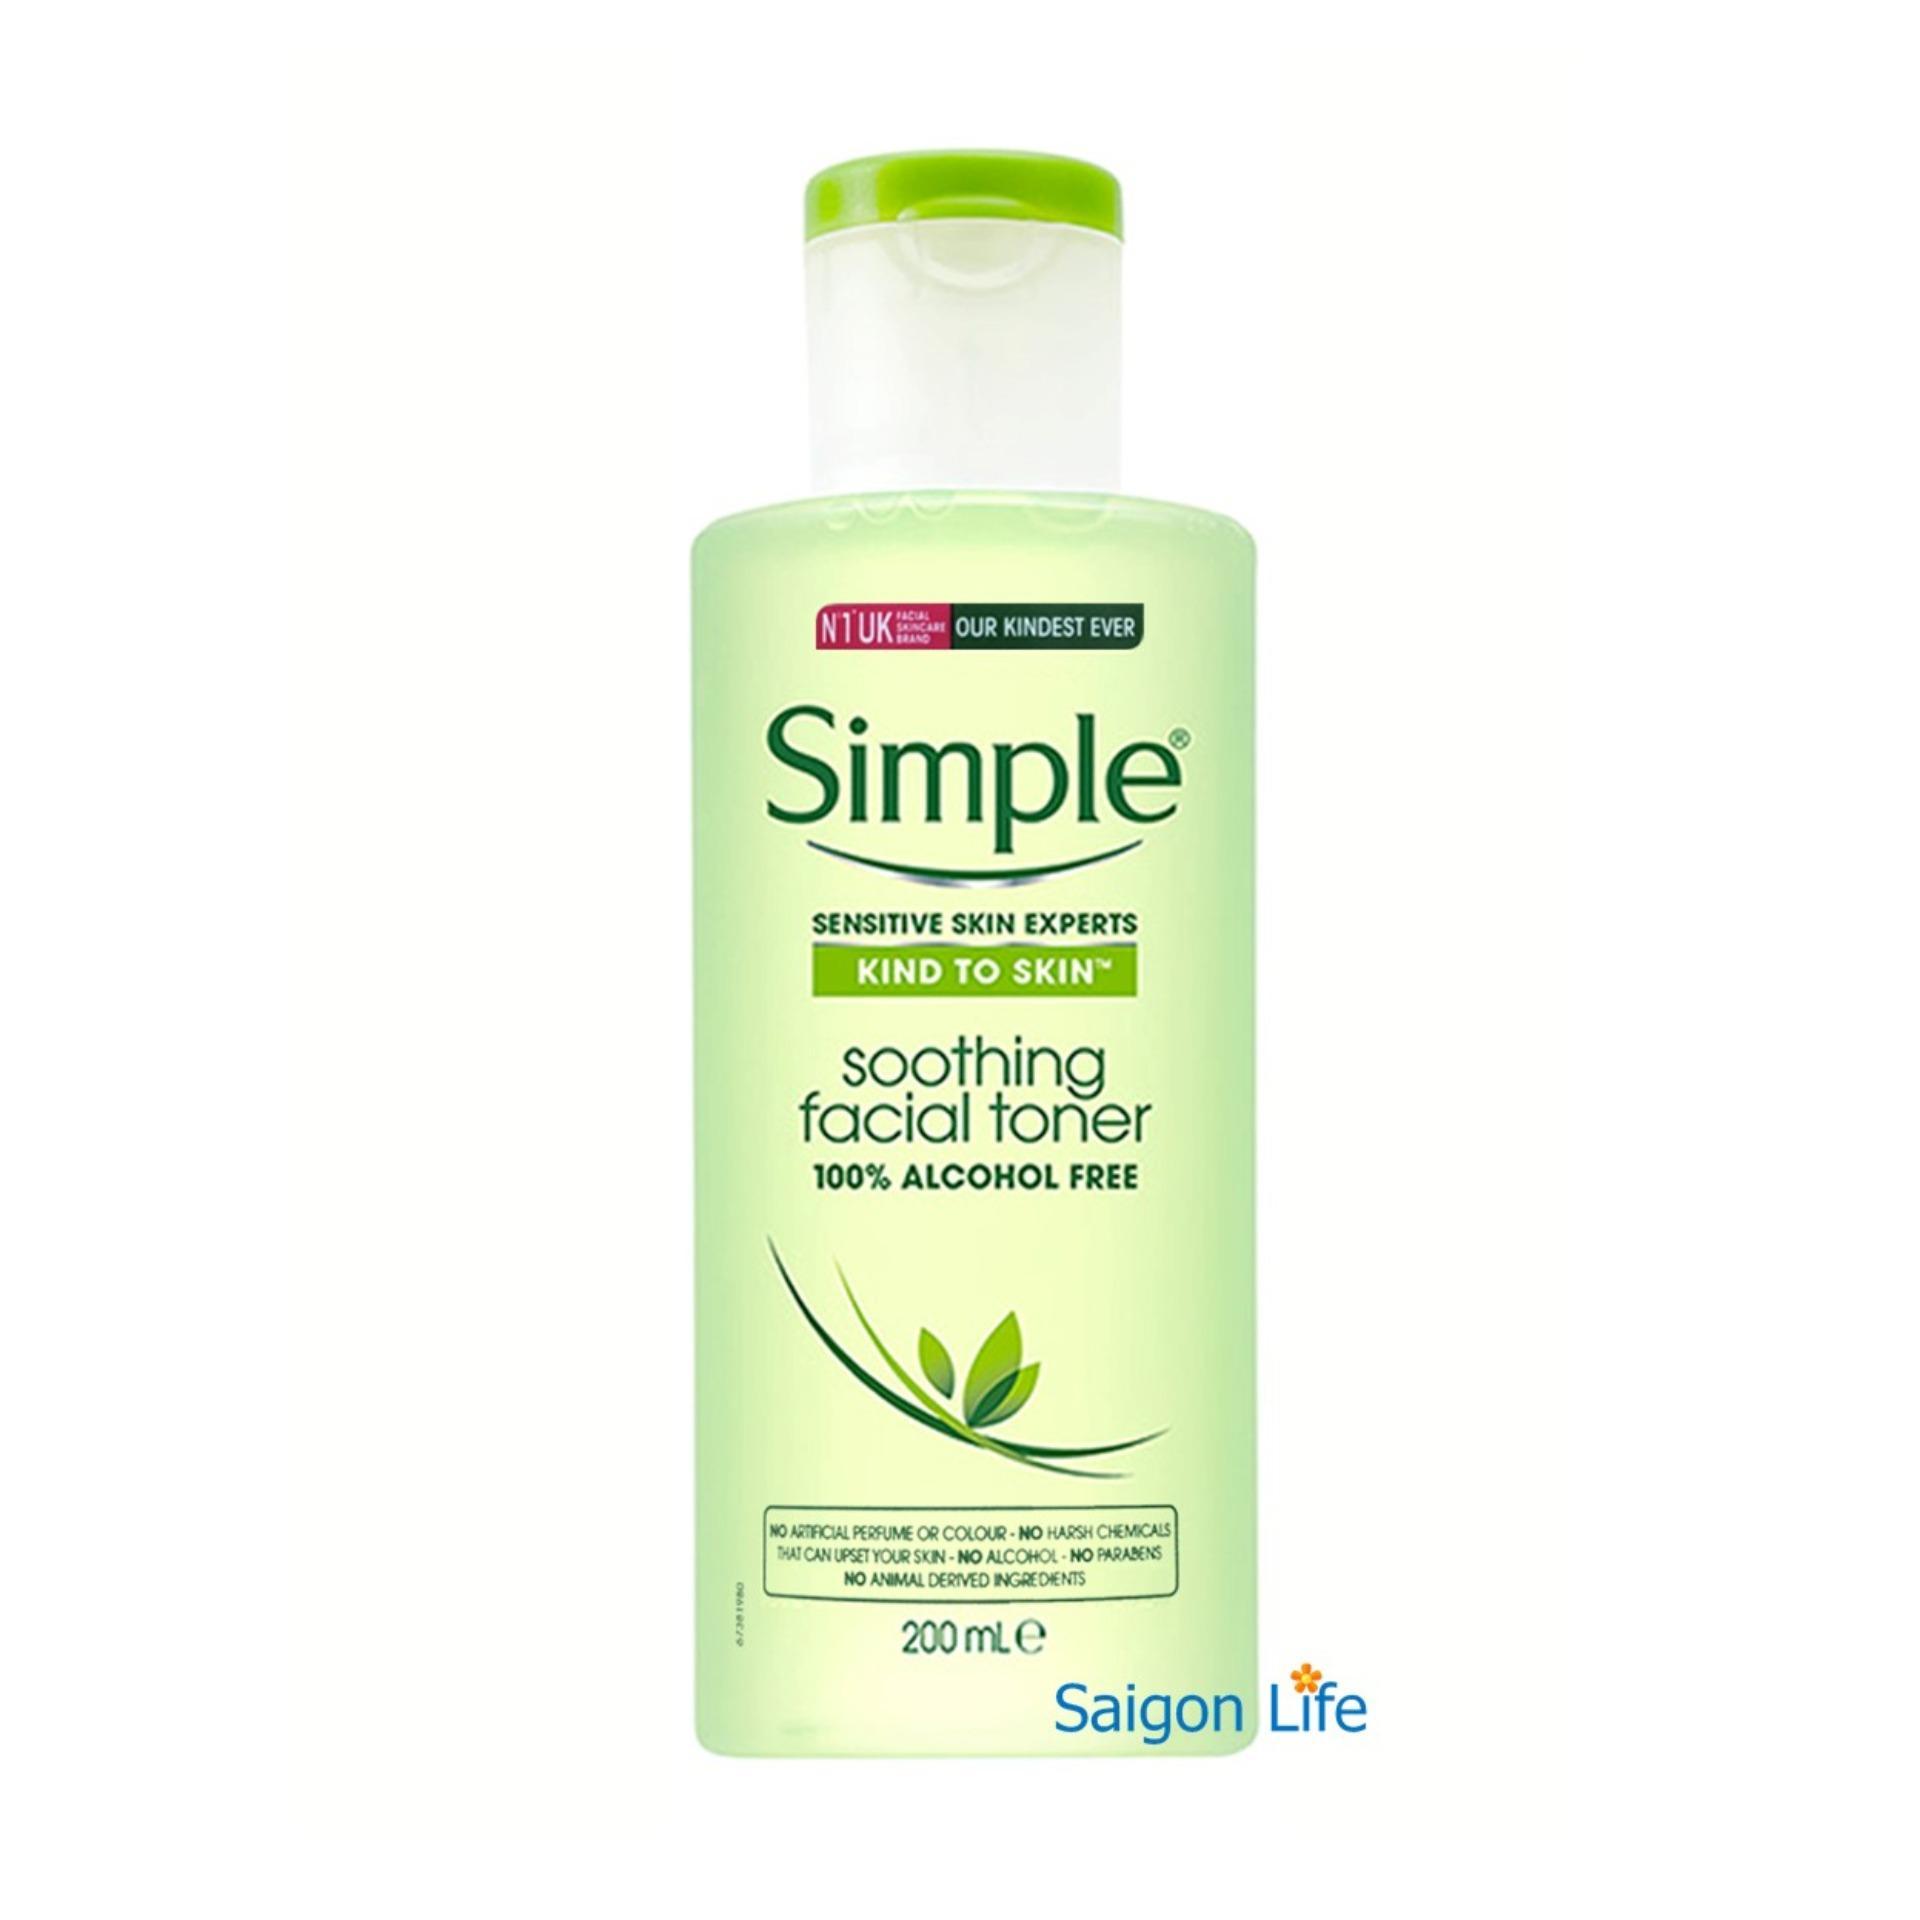 Nước hoa hồng Simple Kind To Skin Soothing Facial Toner 200ml (Mẫu mới)